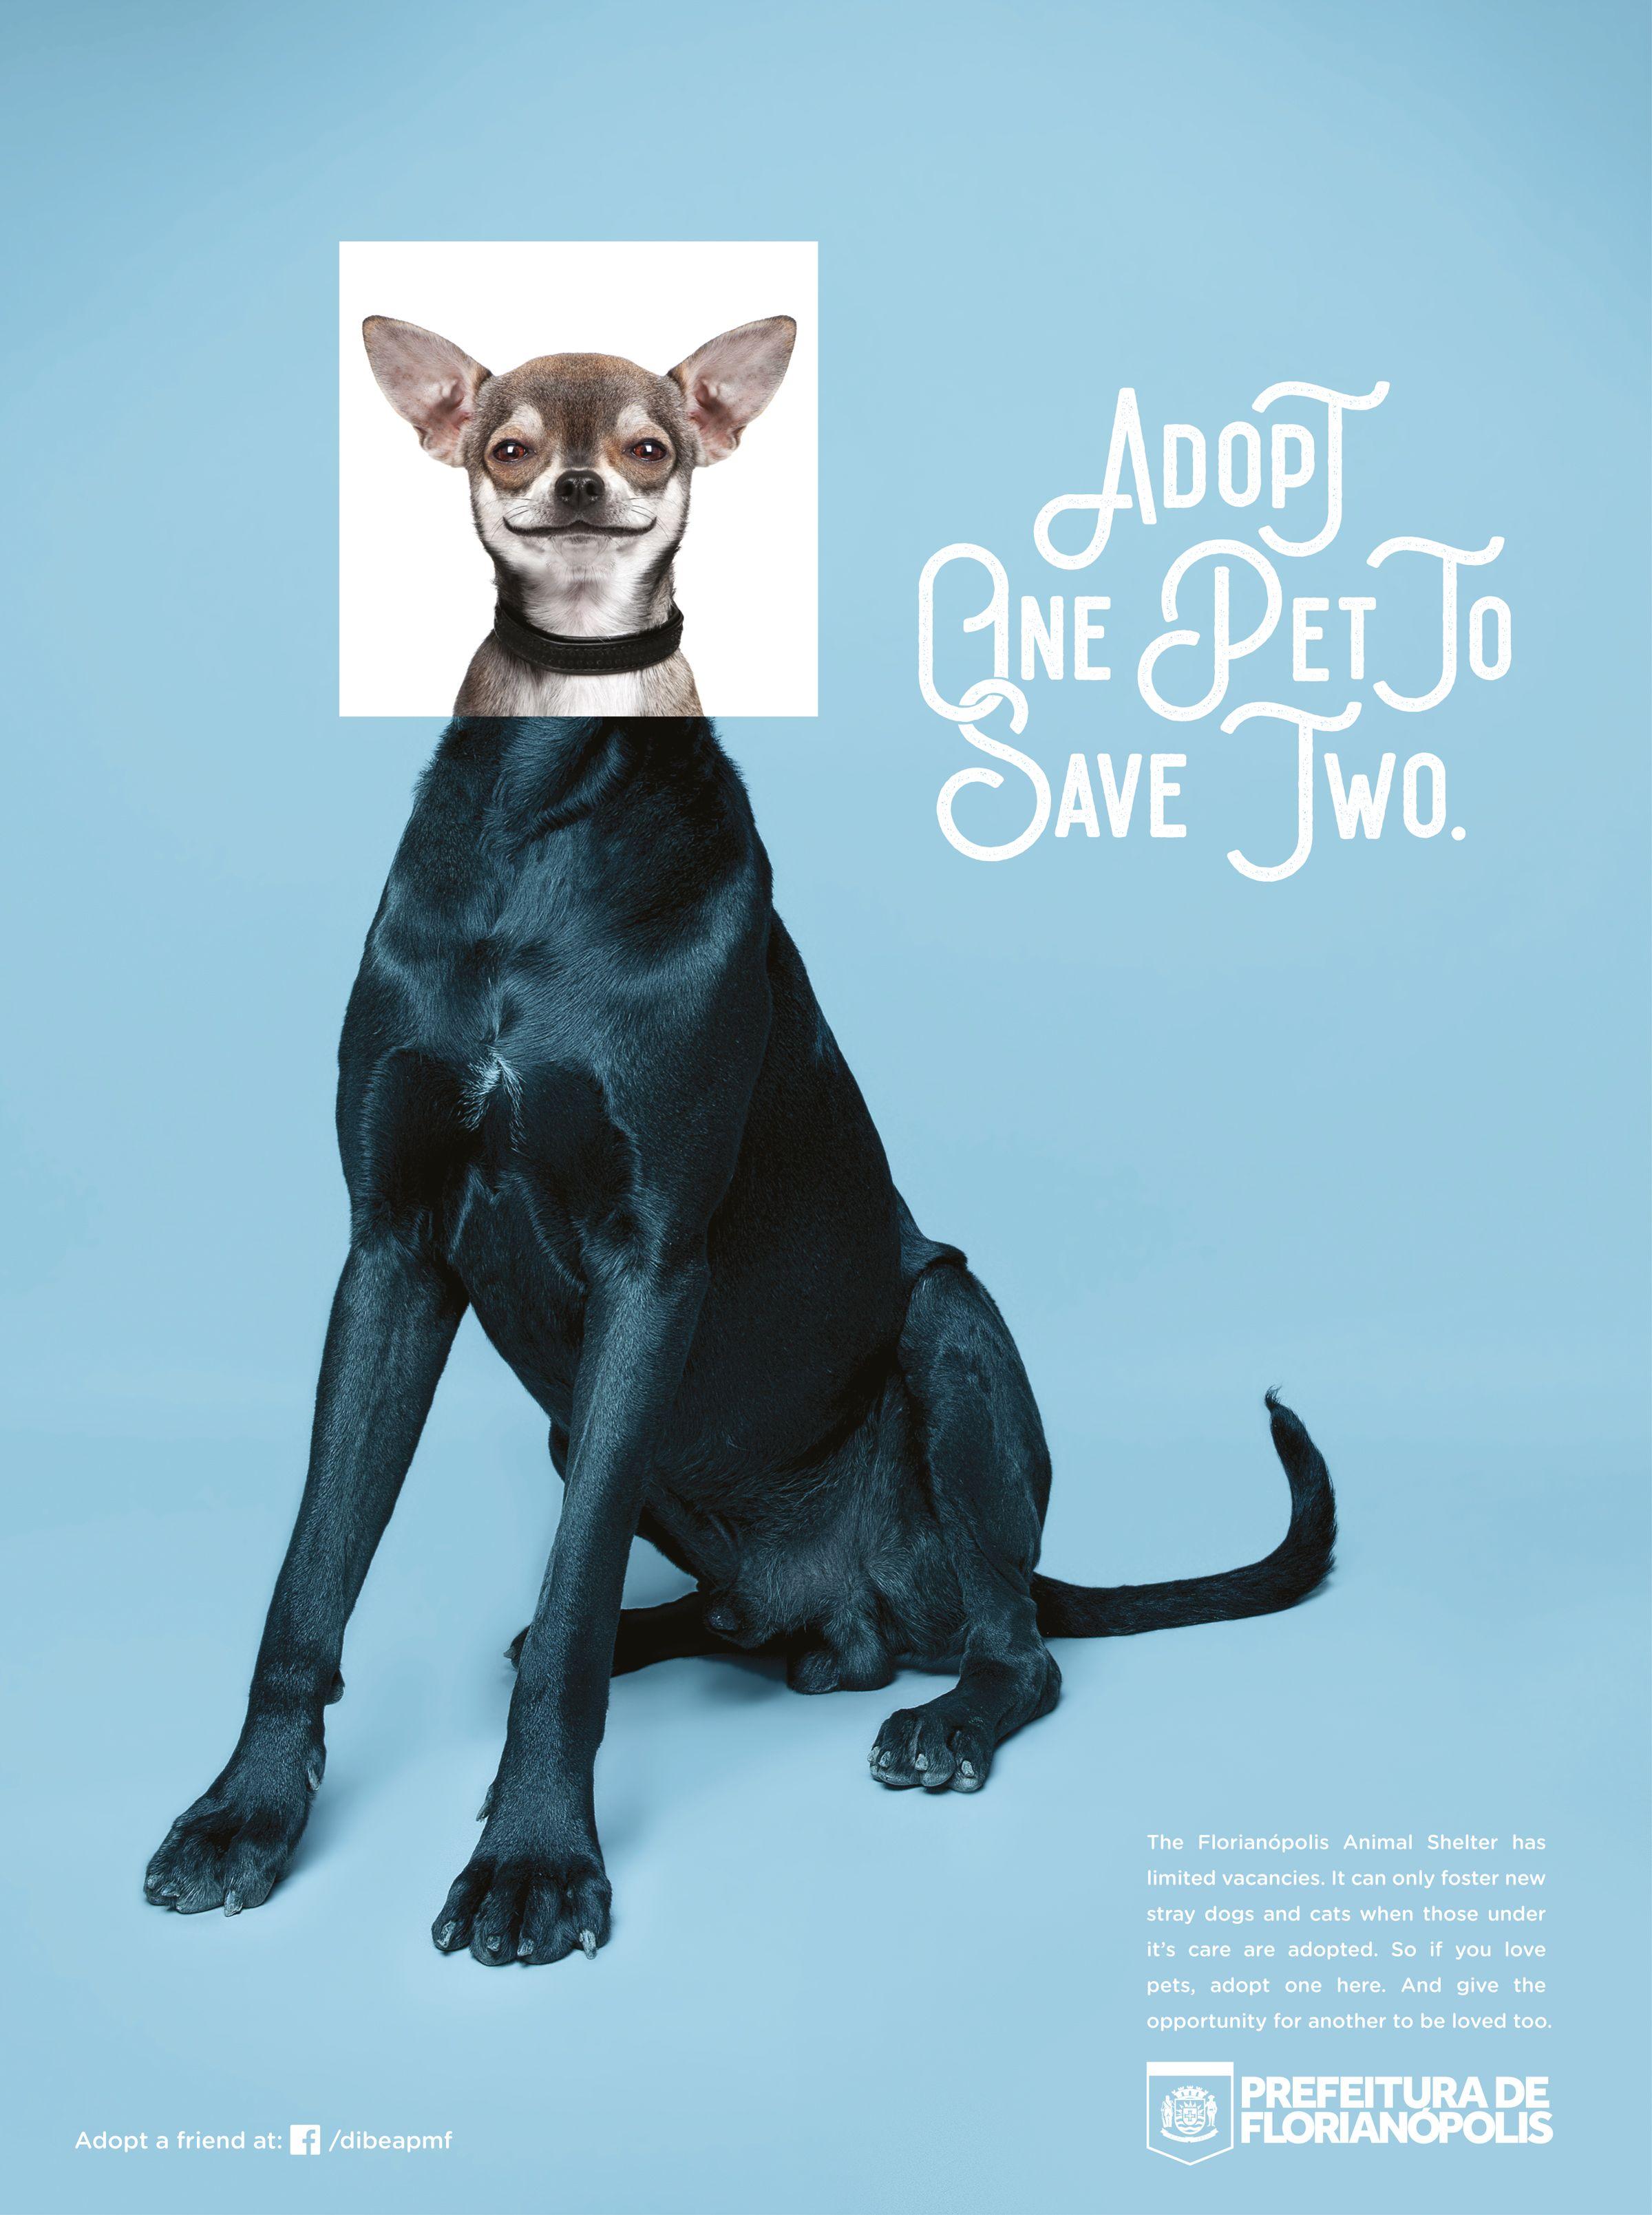 City Of Florianopolis Pets Adeevee Ideias De Design Design Grafico Portfolio